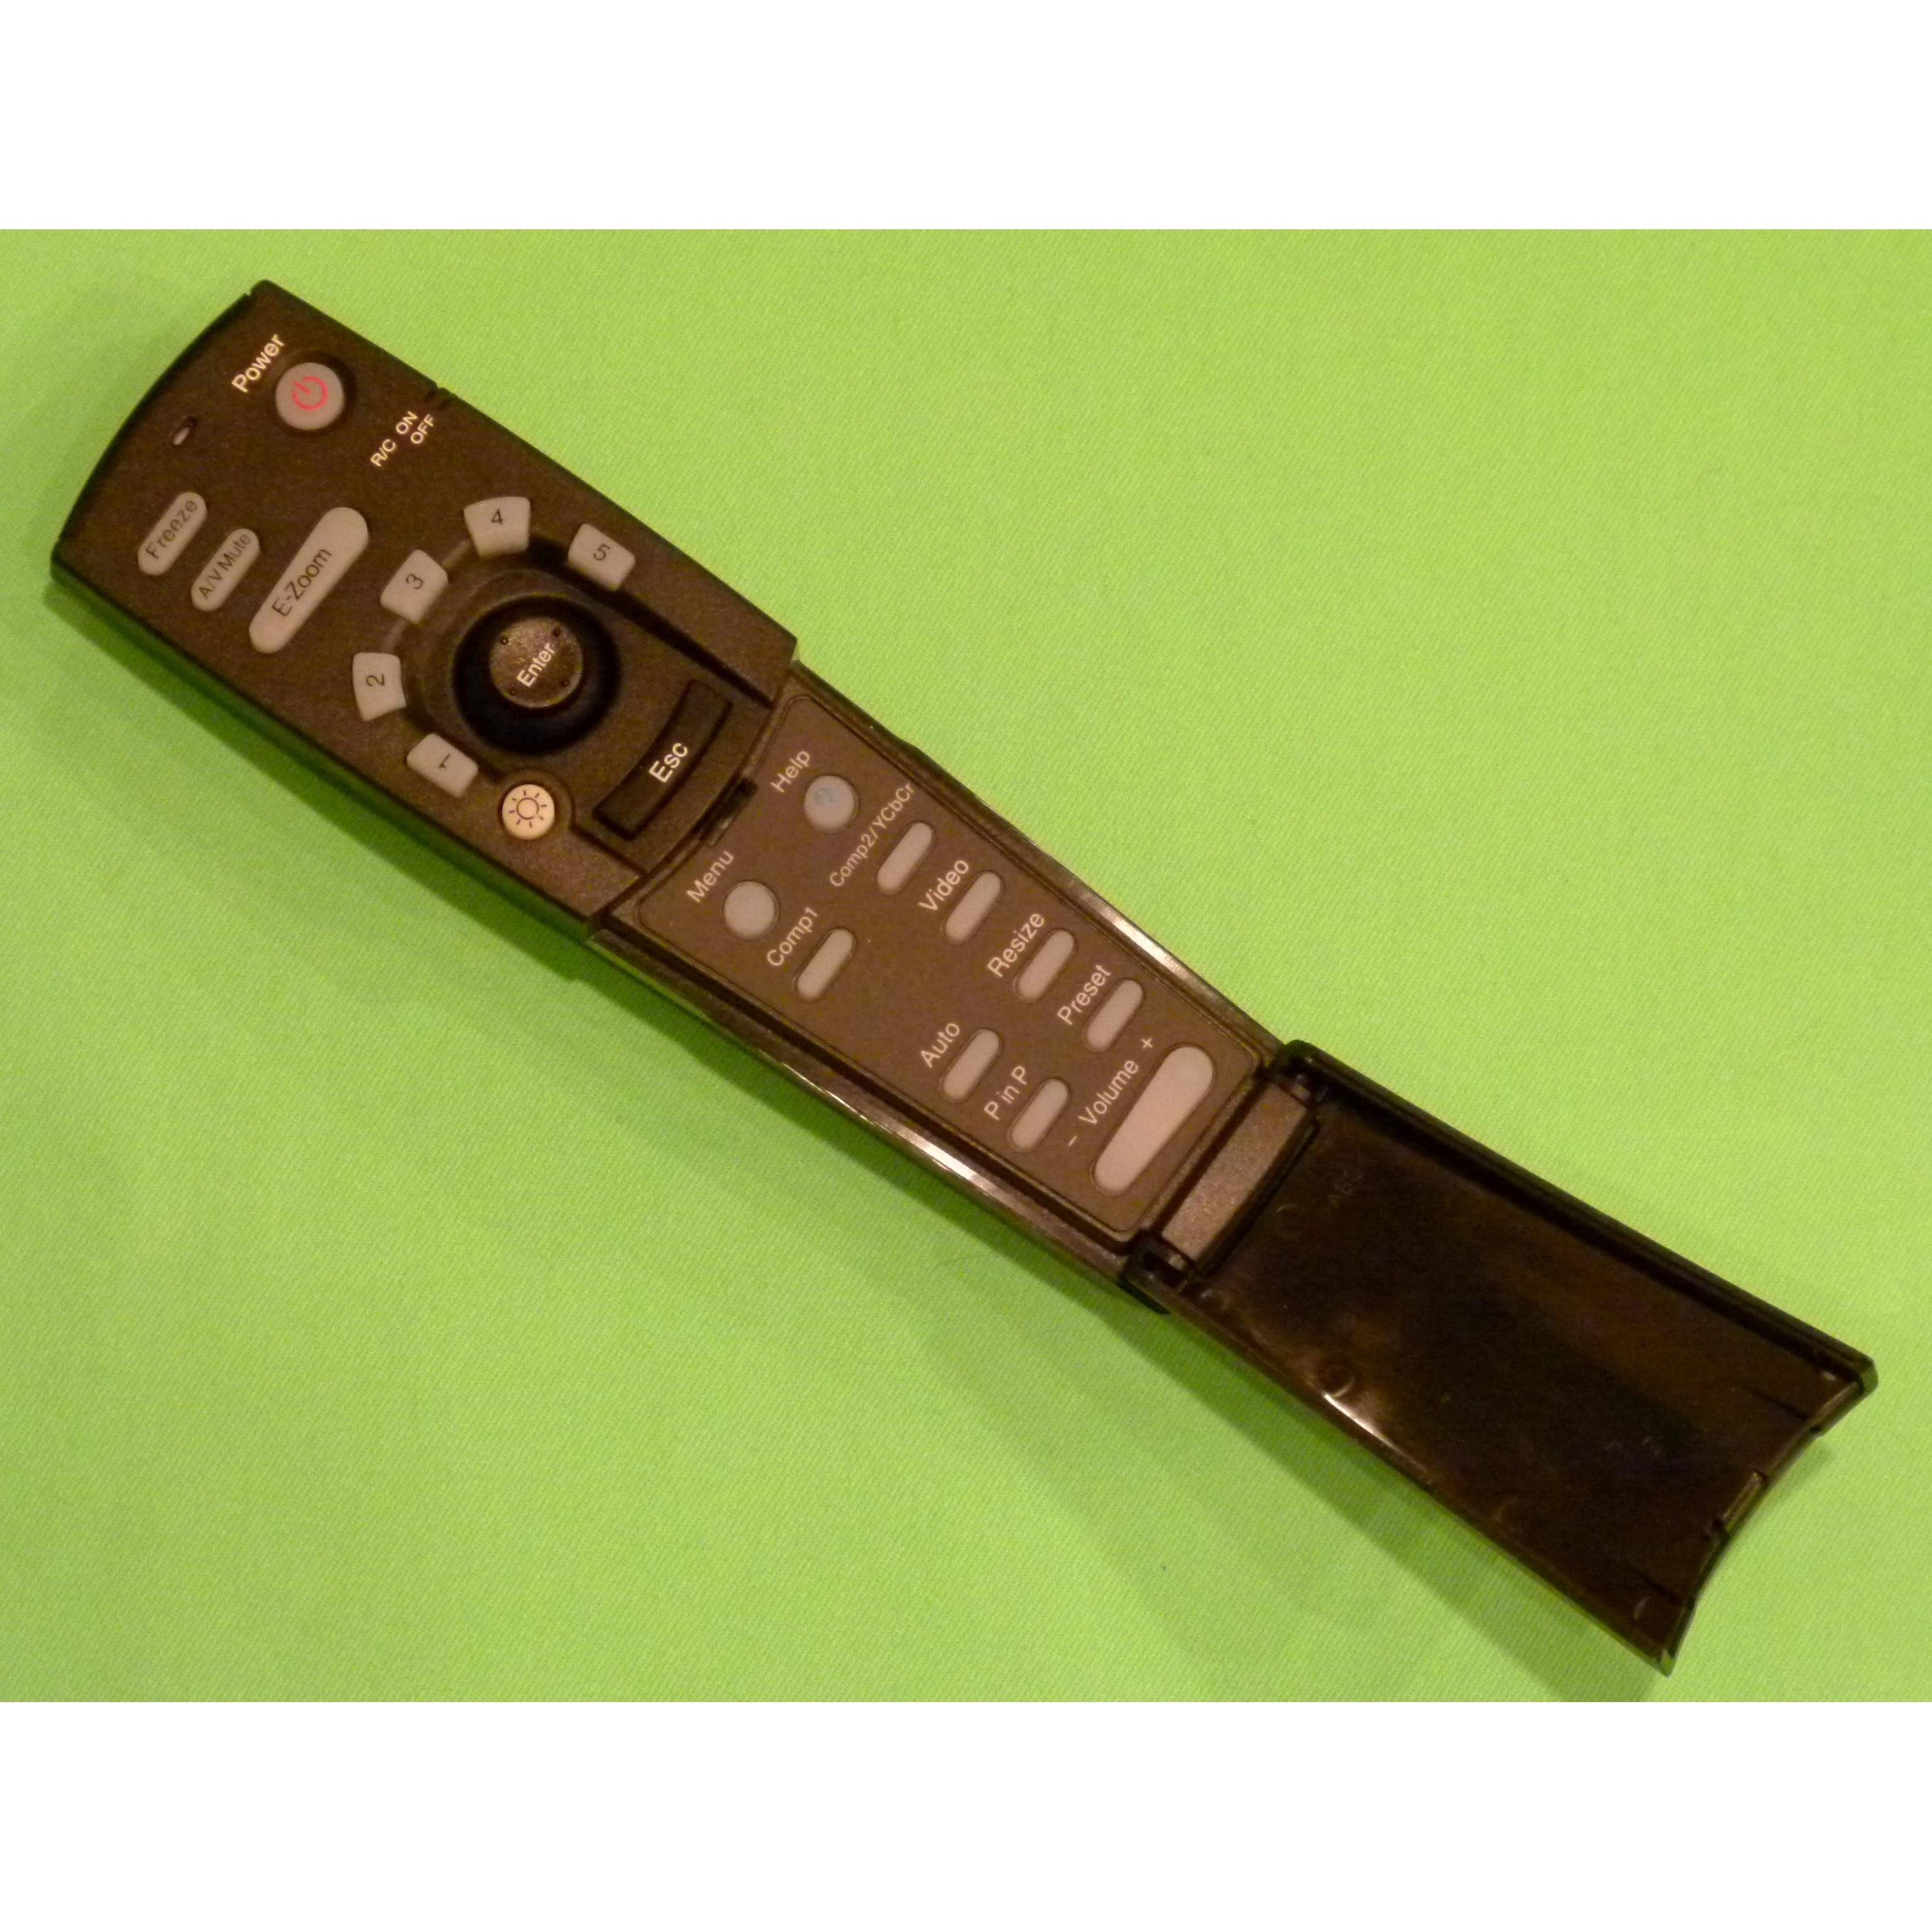 OEM Epson Projector Remote Control Shipped With PowerLite 5530U PowerLite 5535U